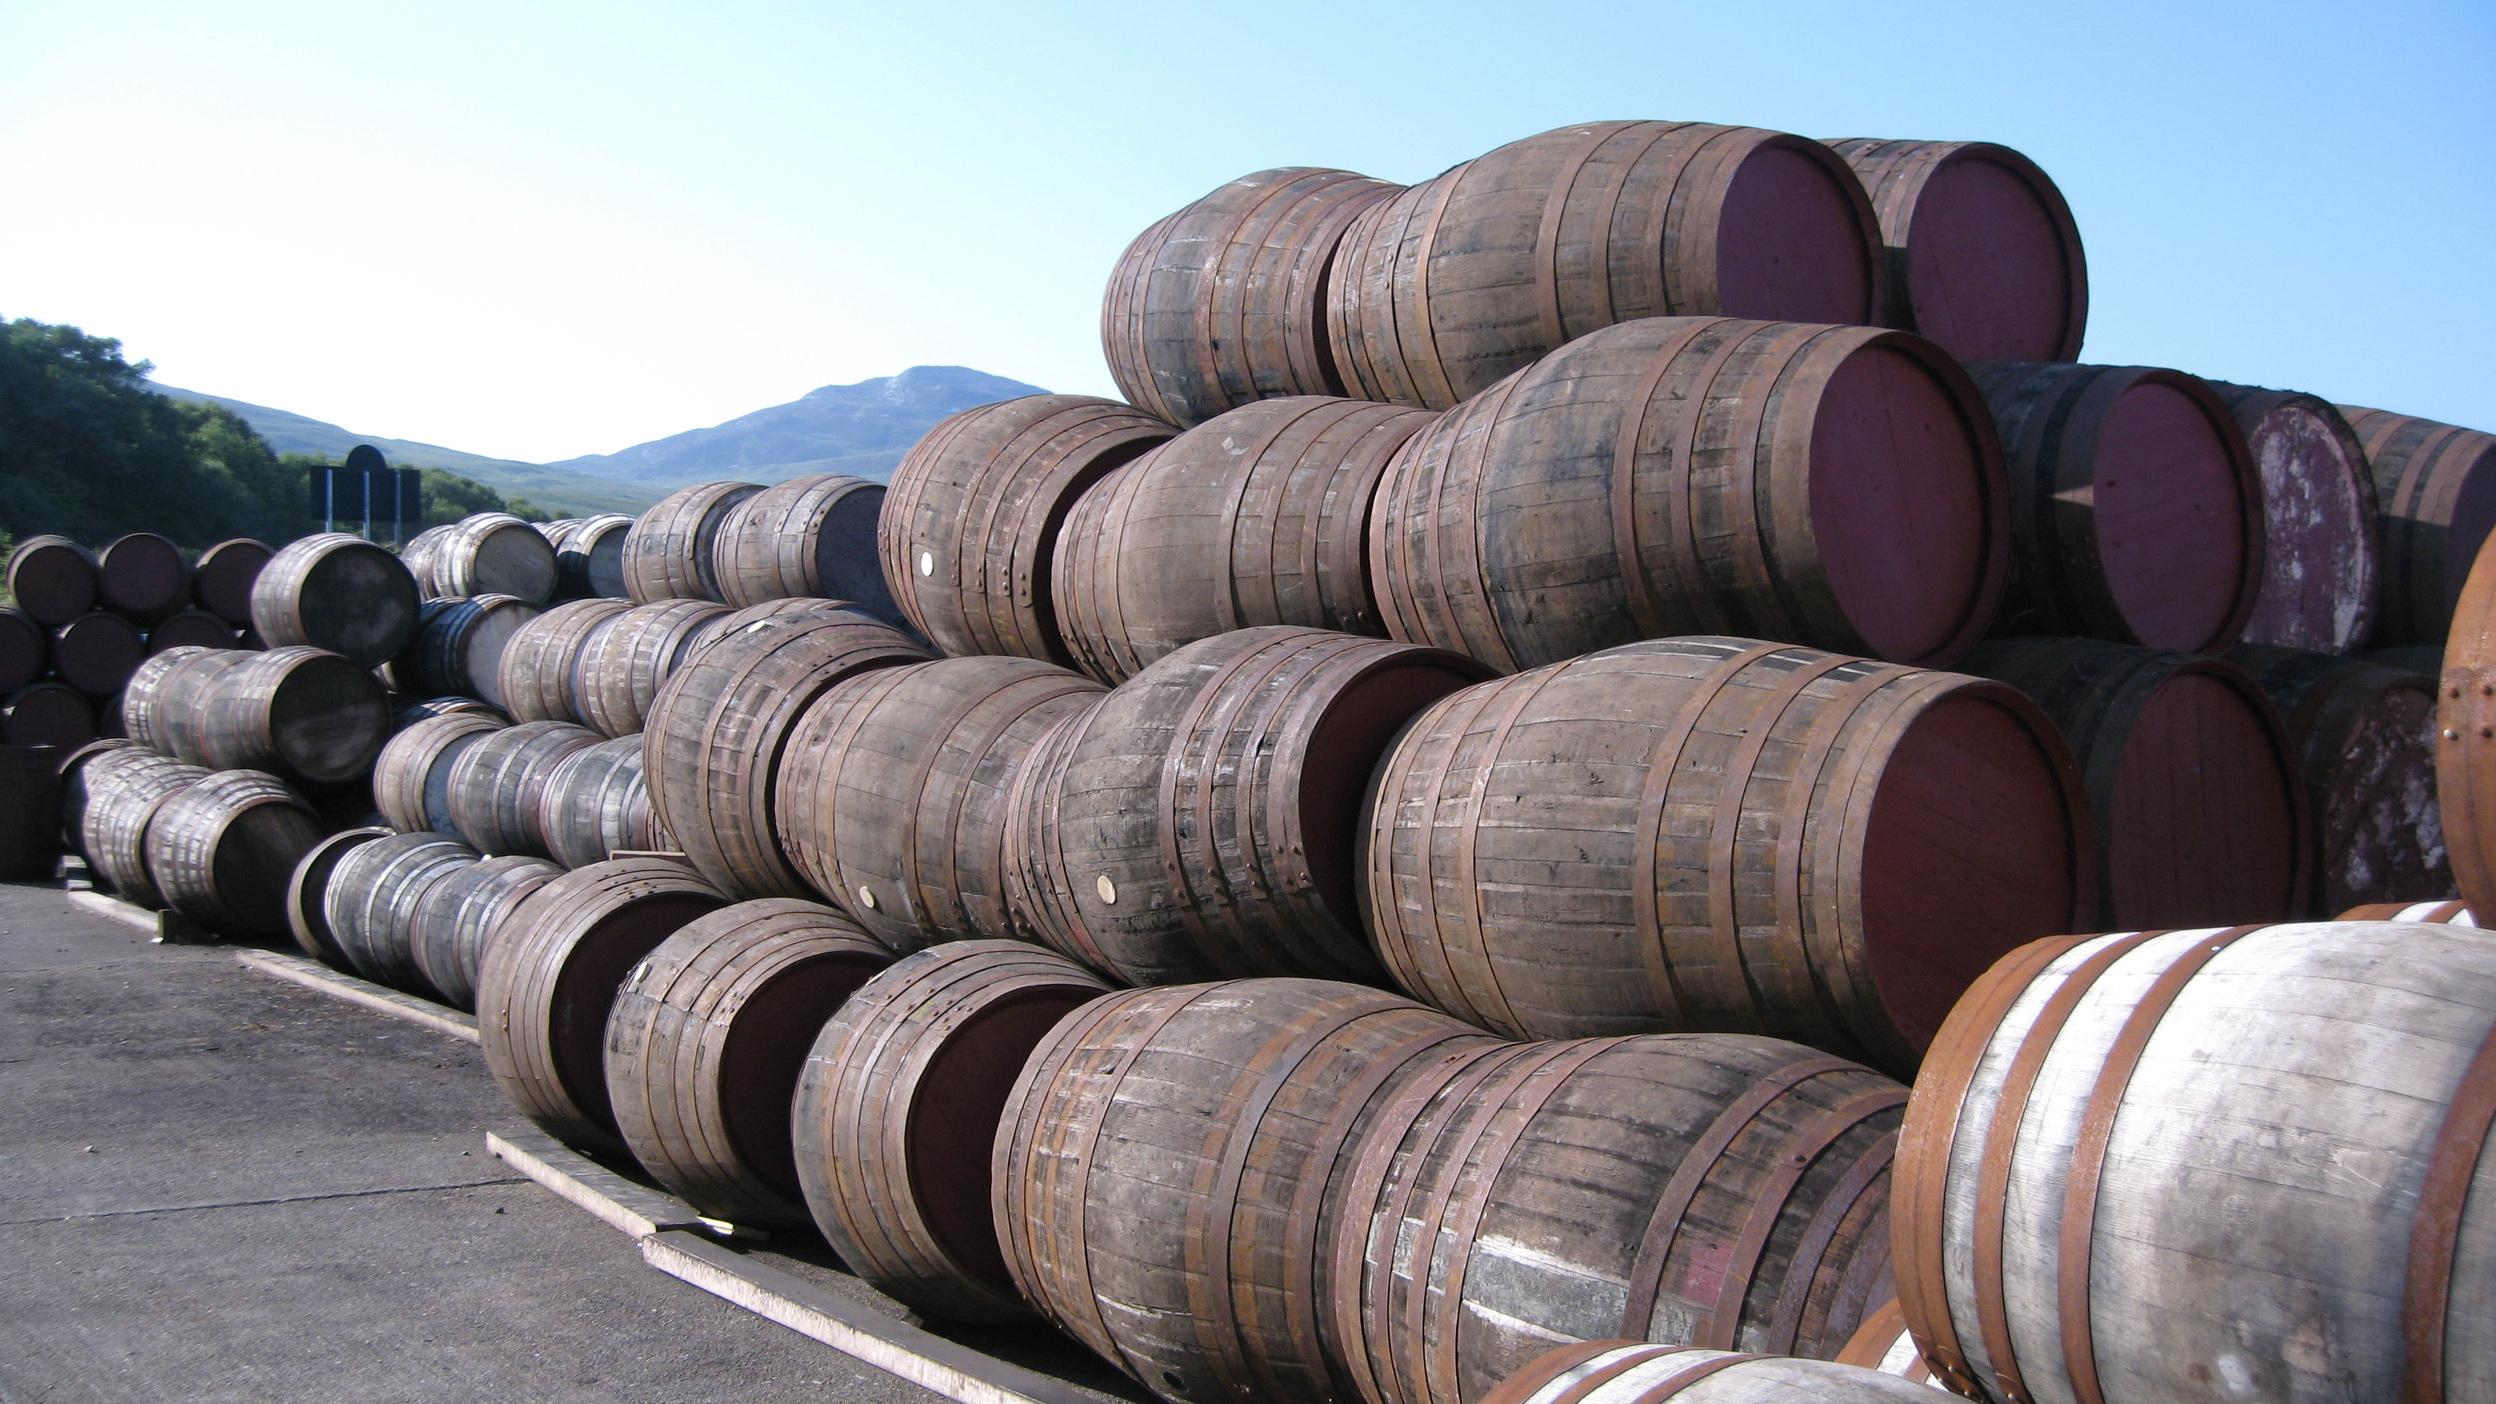 Whisky casks for maturing whisky